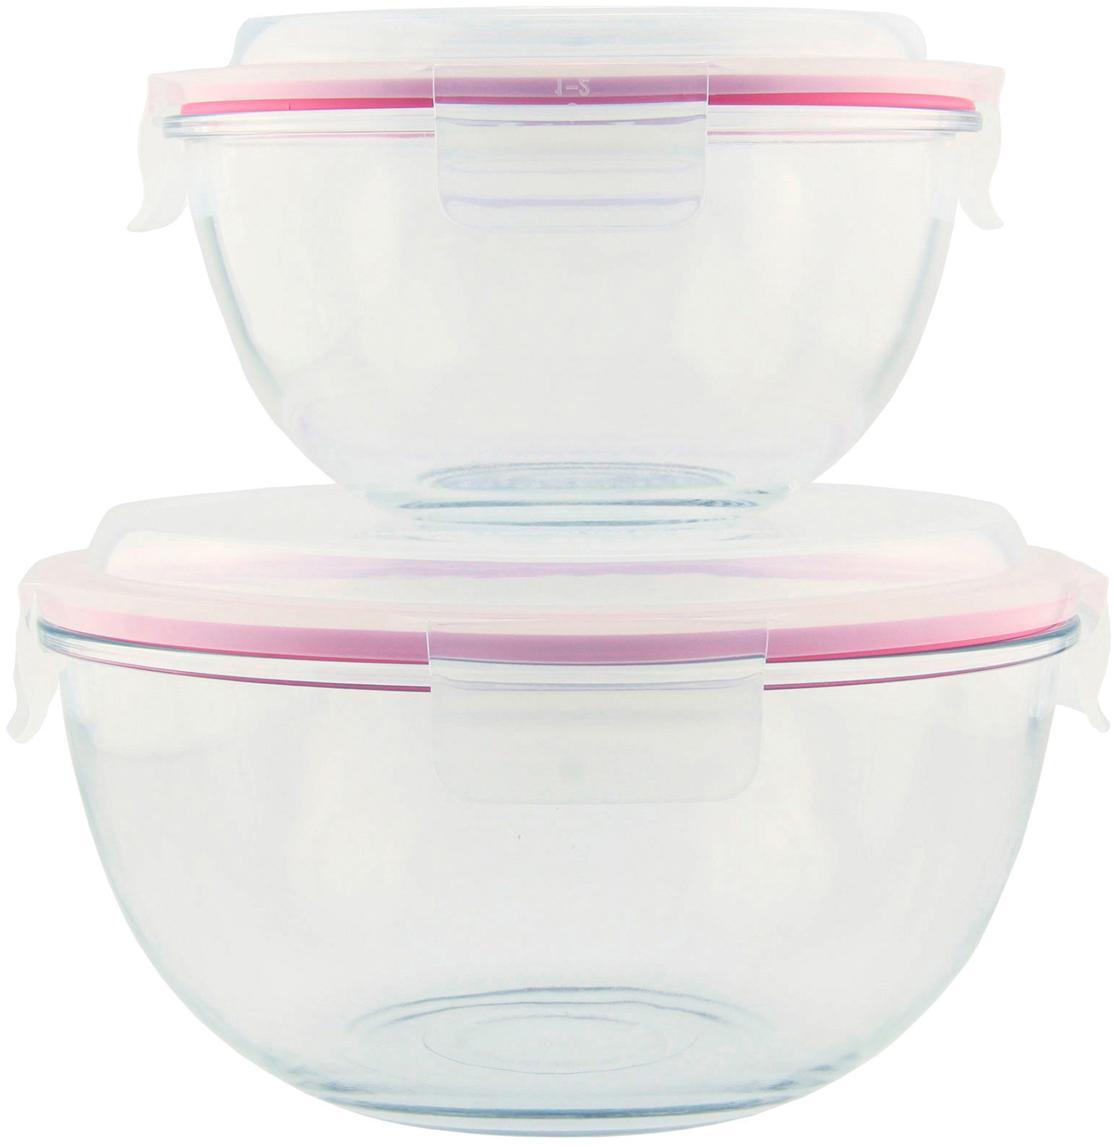 Set de boles herméticos Lilo, 2pzas., Recipiente: vidrio templado, libre de, Transparente, rosa, Set de diferentes tamaños